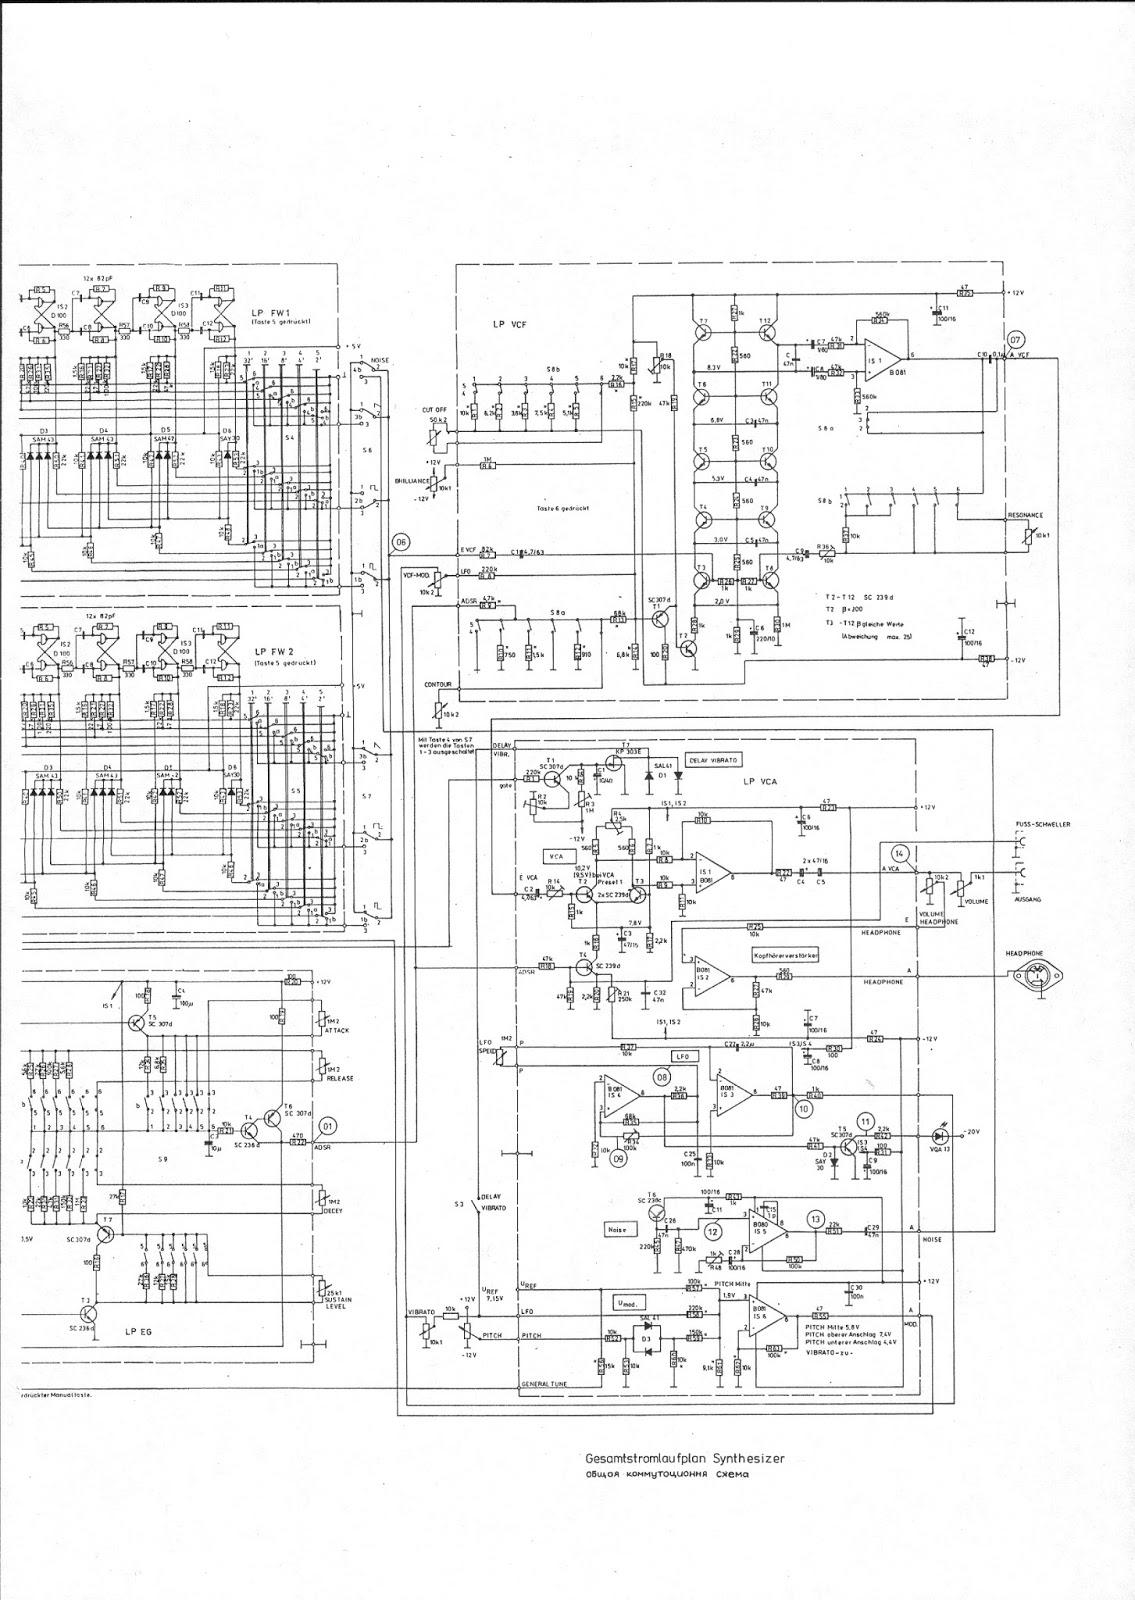 Infrequent Sound [sex.tex] technology: Vermona Synthesizer